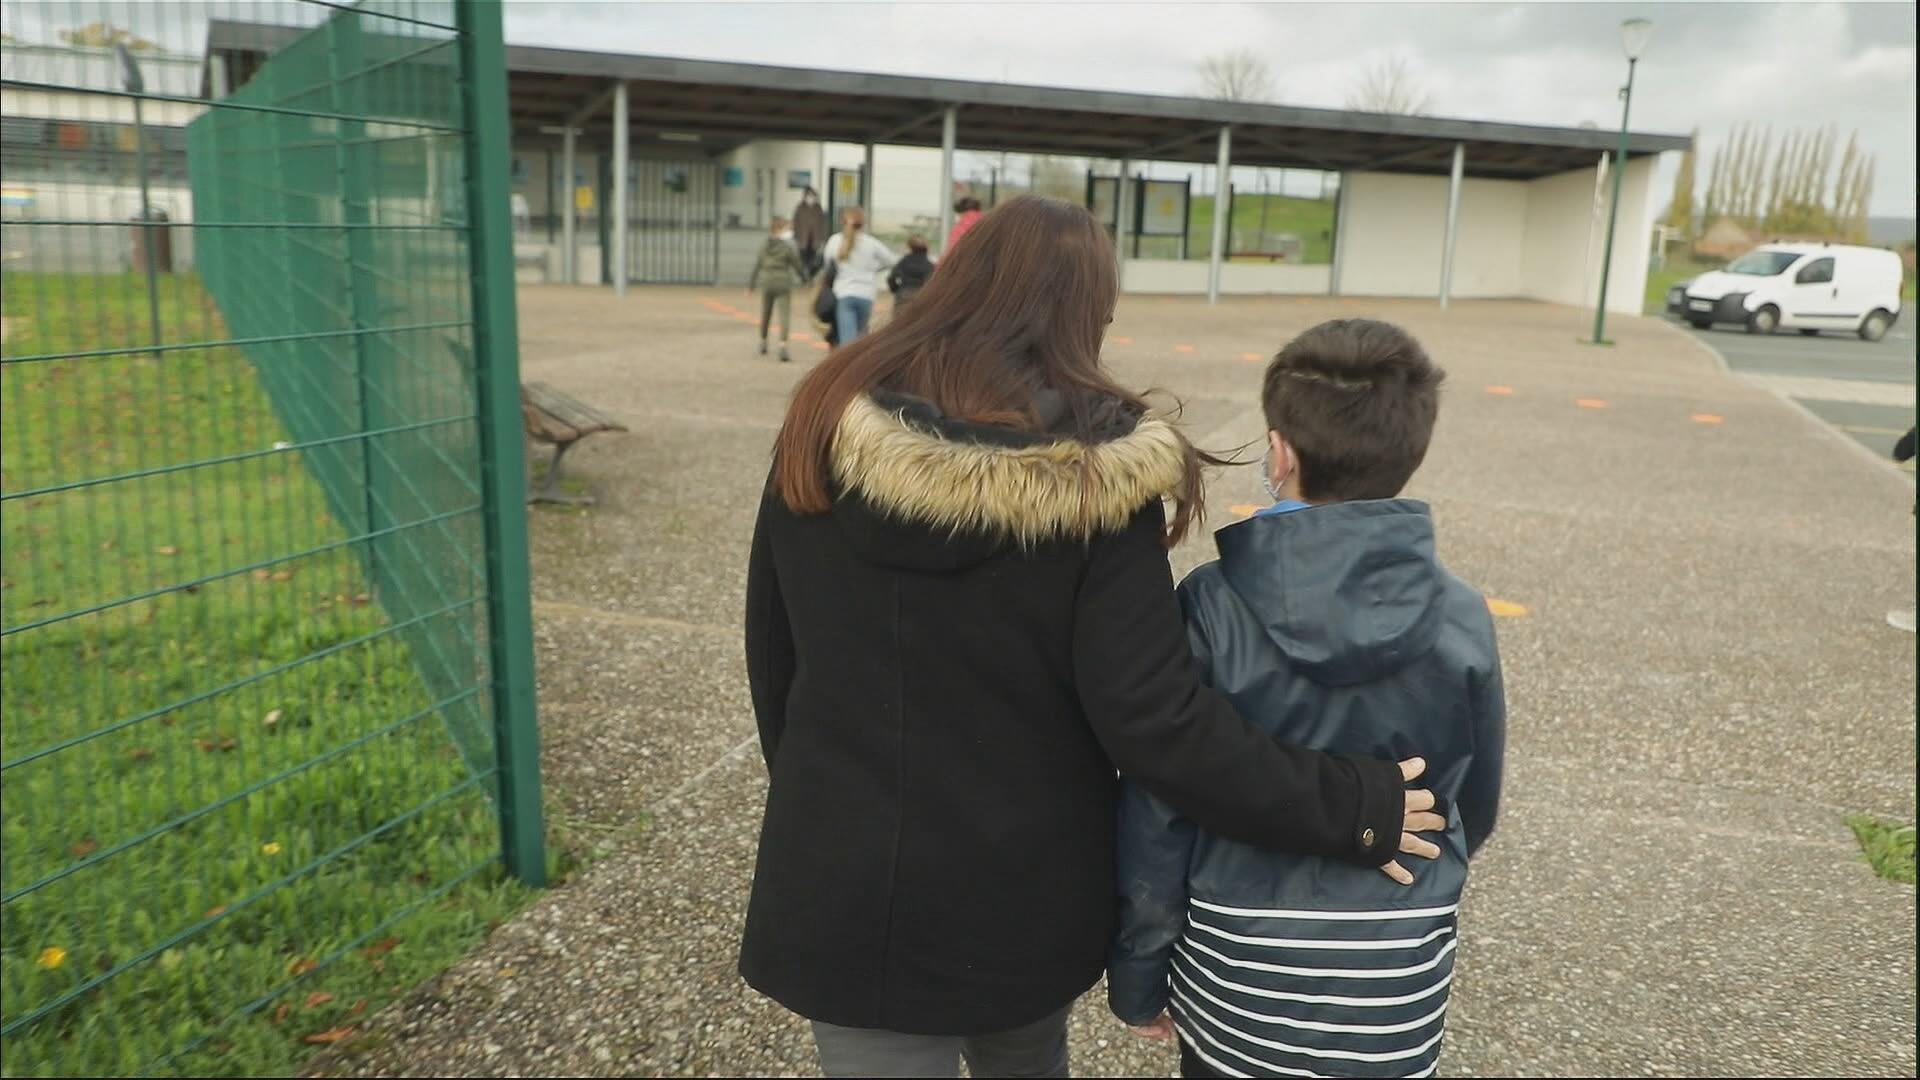 FR MG EMISSION CEST EN FRANCE ENFANTS PLACES NO MIX 2